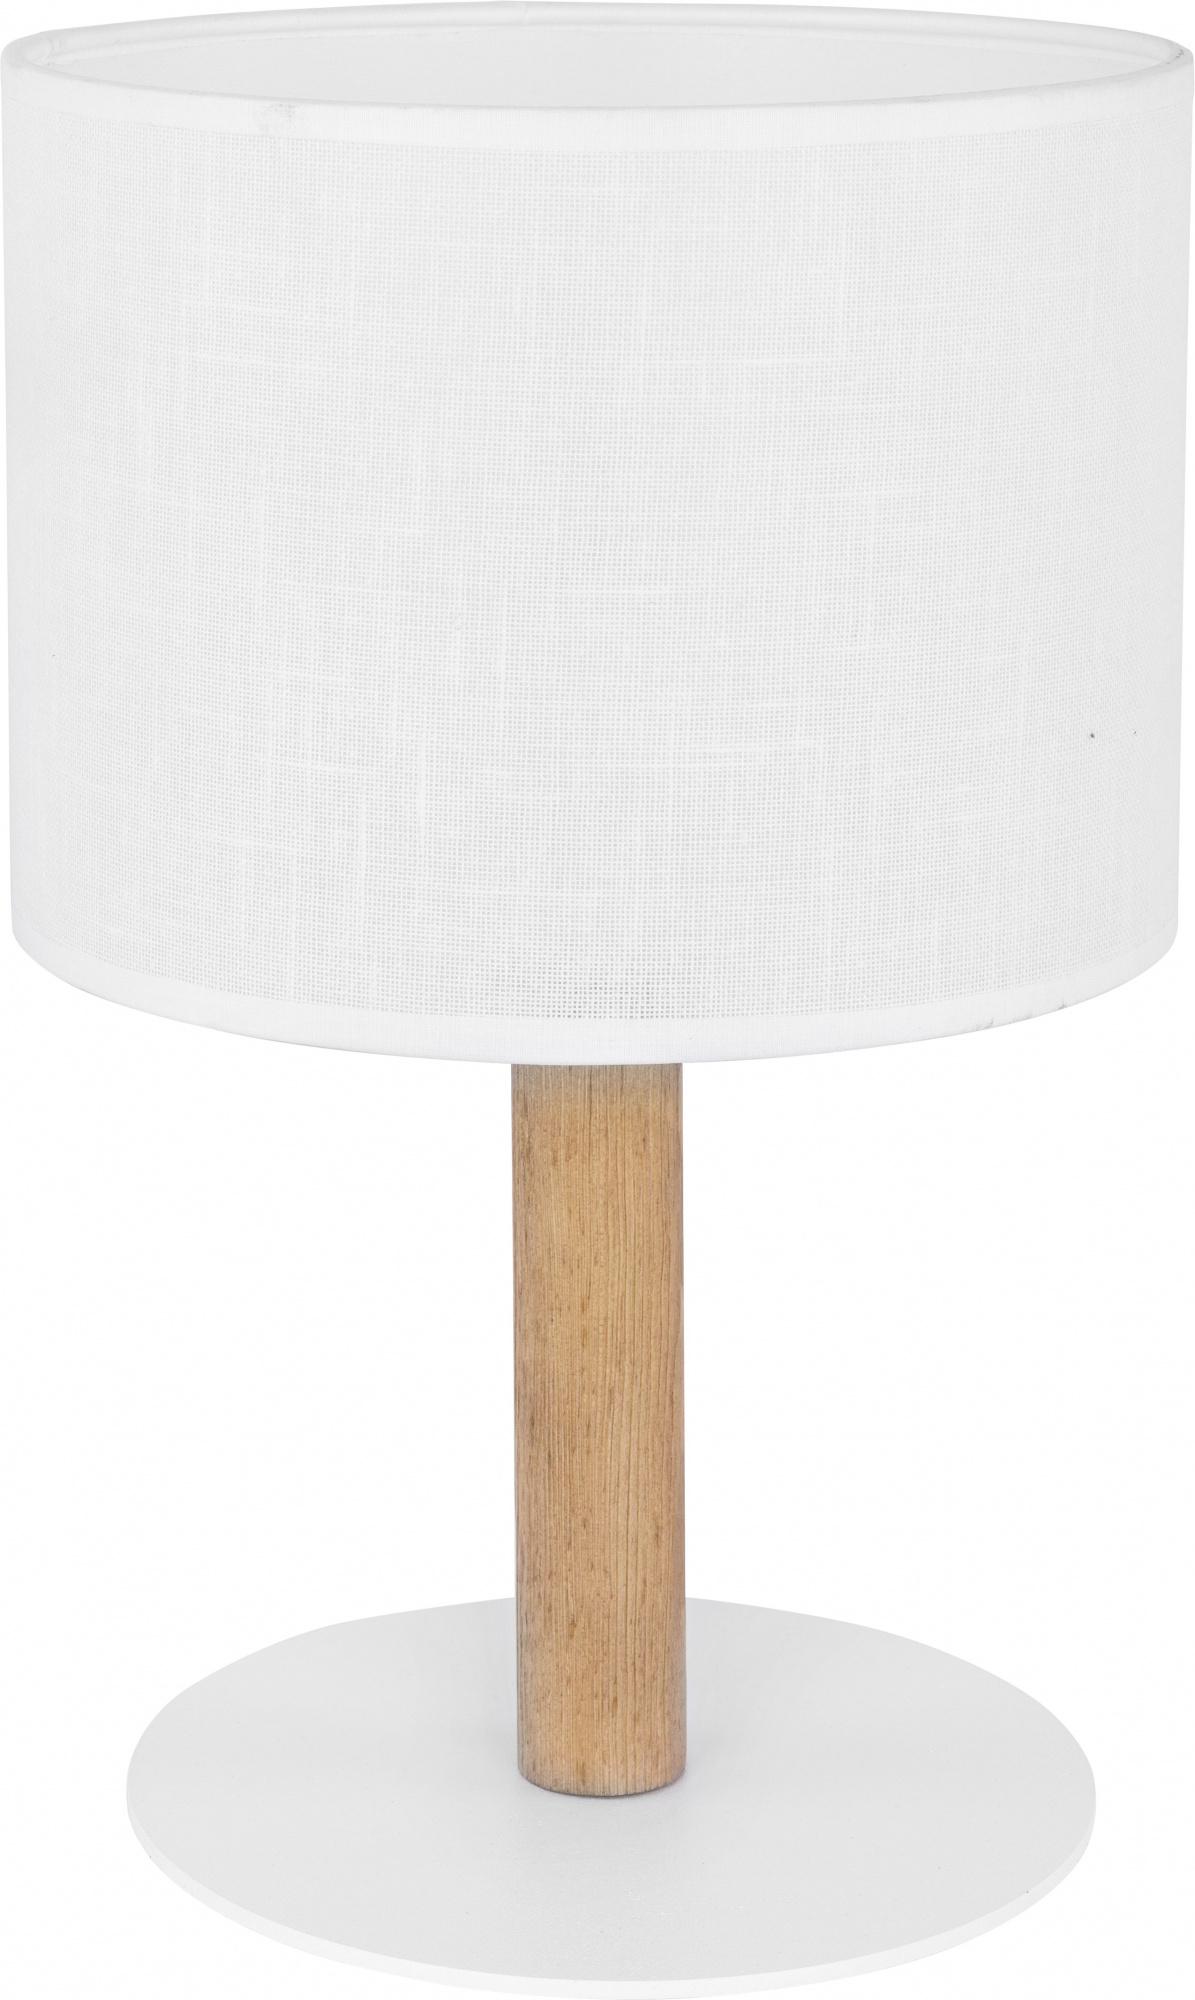 TK Lighting TK-5217 Deva asztali lámpa